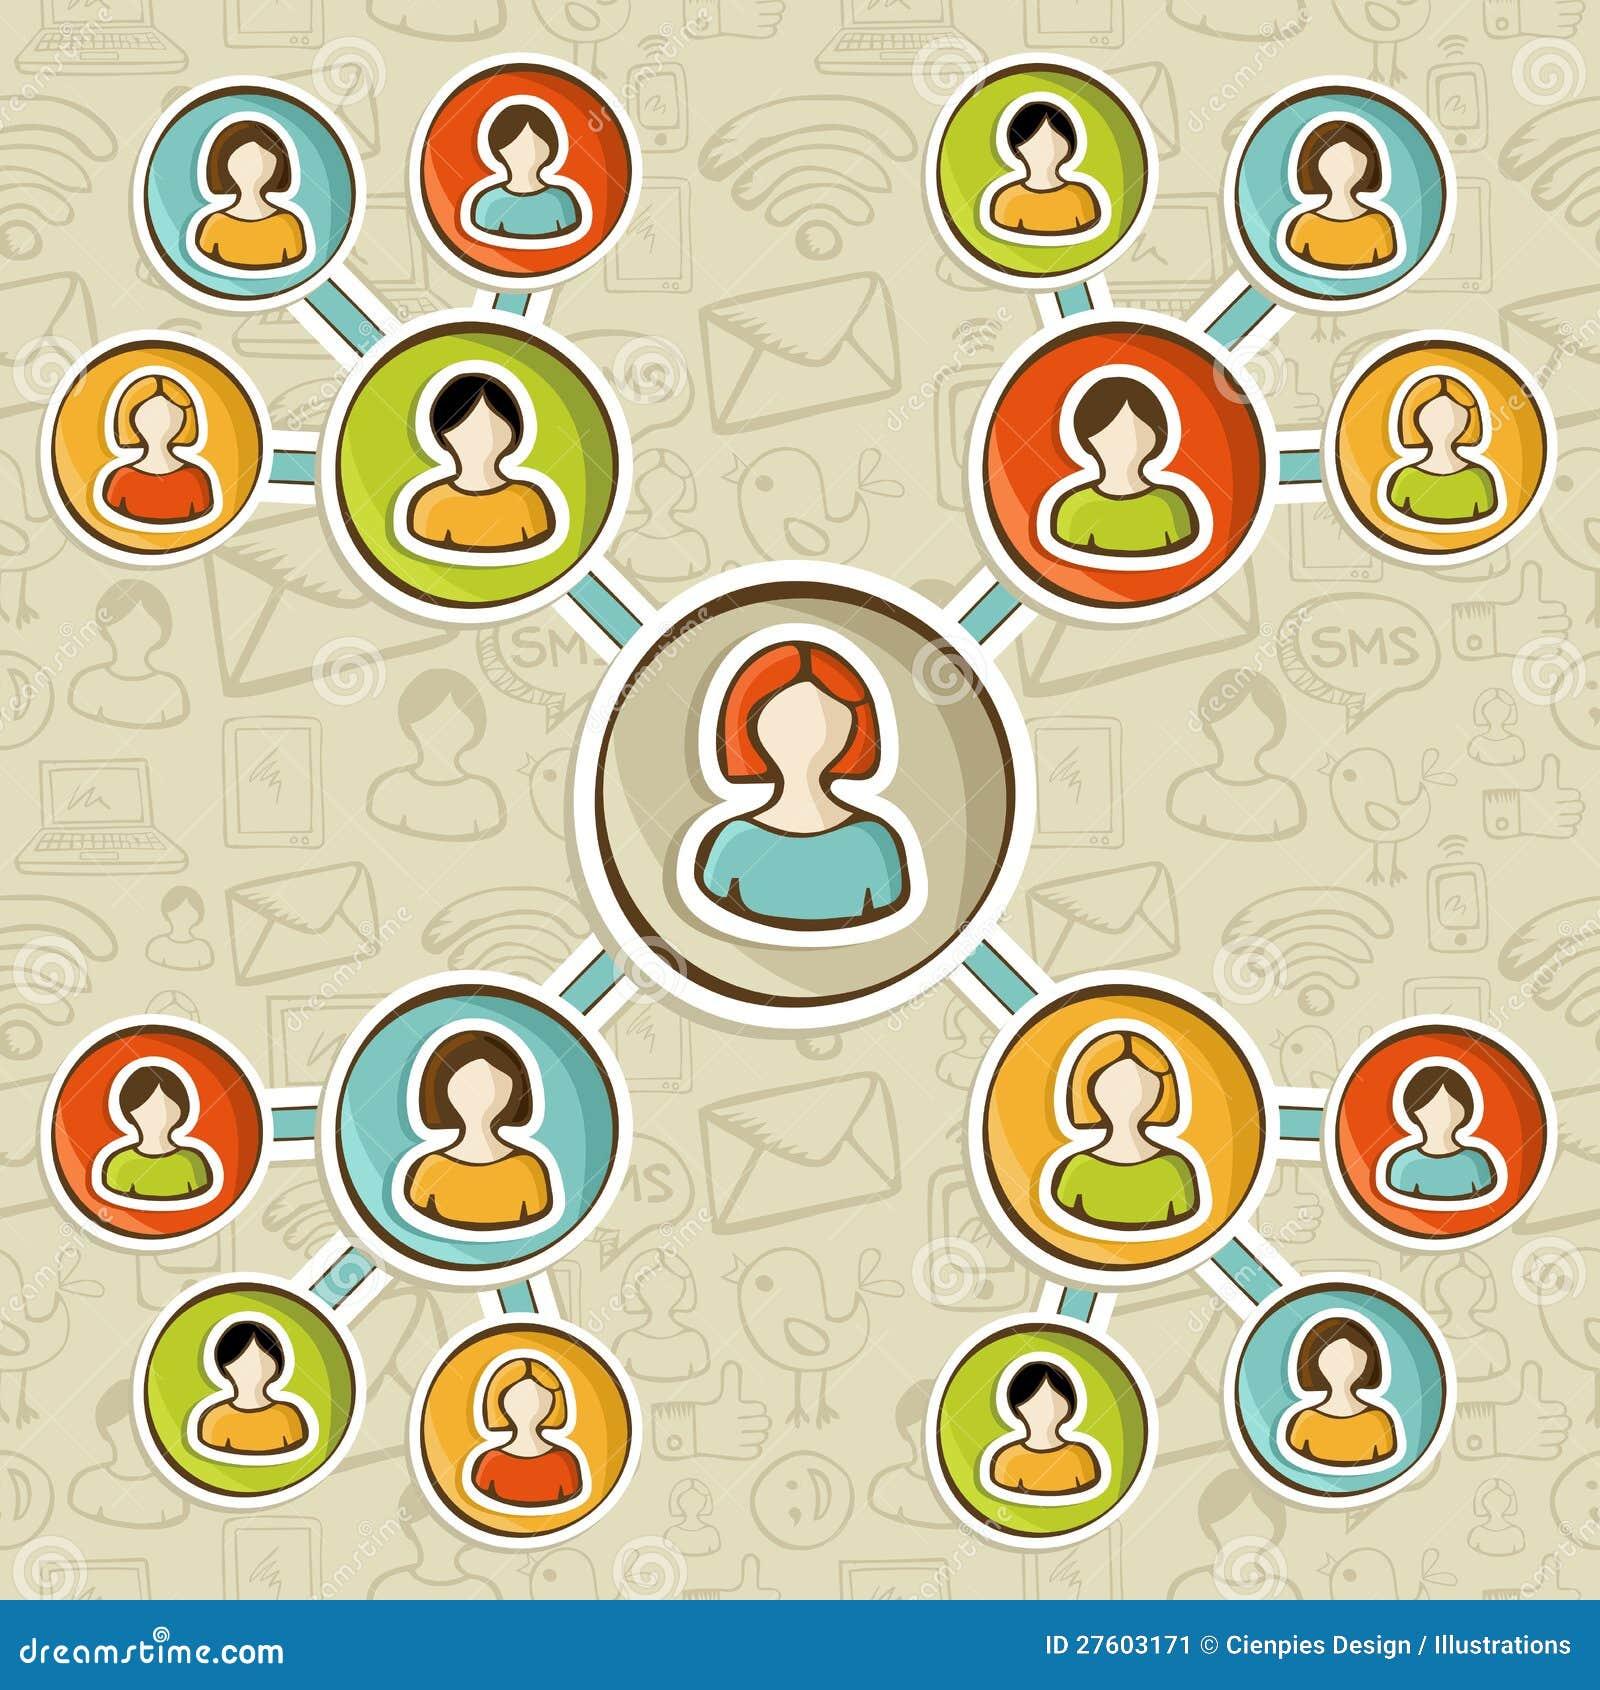 Web marketing diagram stock vector illustration of data 27603171 ccuart Choice Image